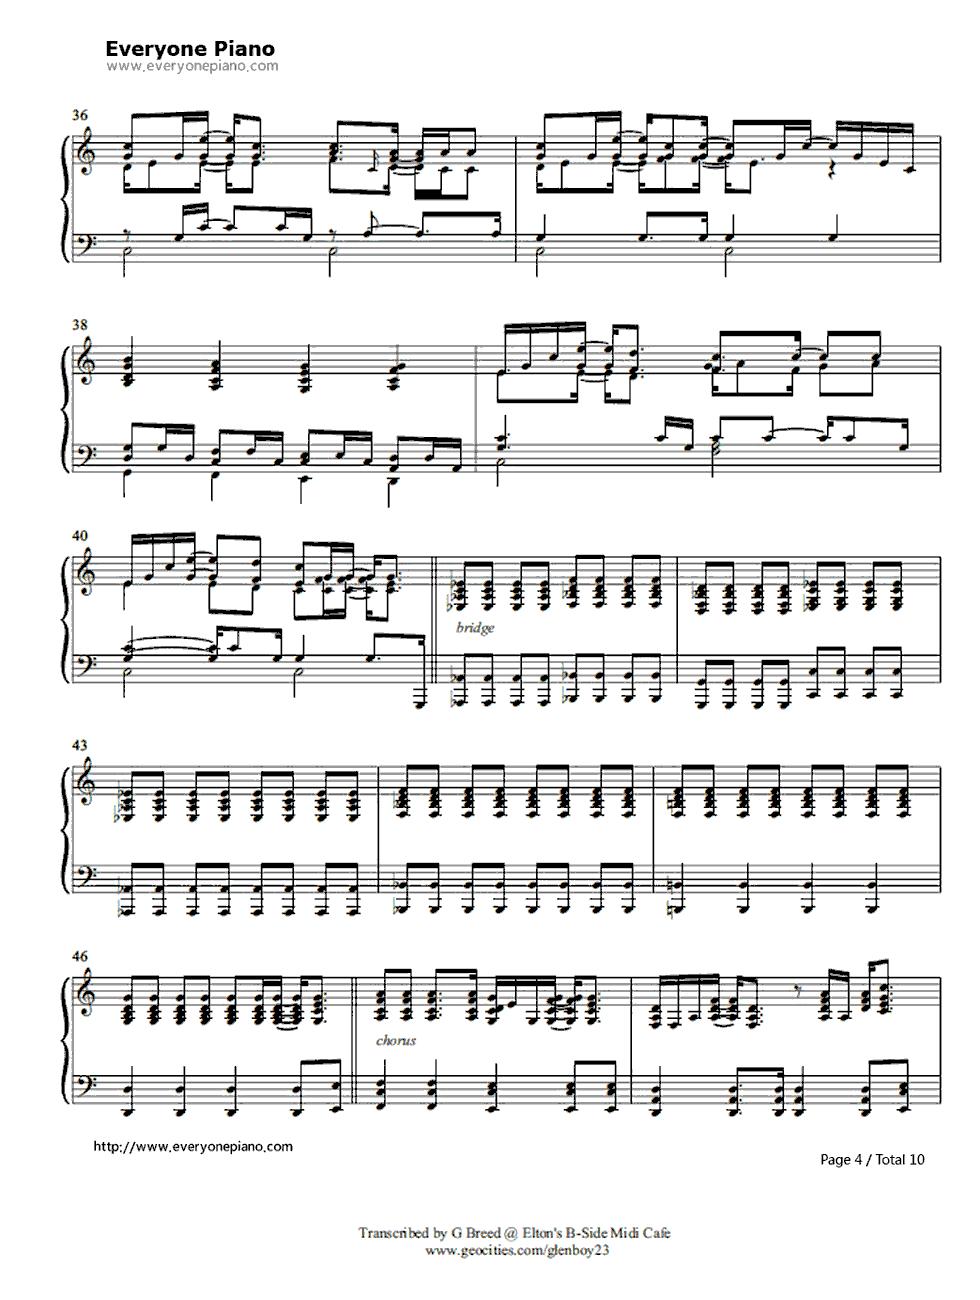 Tiny dancer elton john stave preview 4 free piano sheet music listen now print sheet tiny dancer elton john stave preview 4 hexwebz Gallery